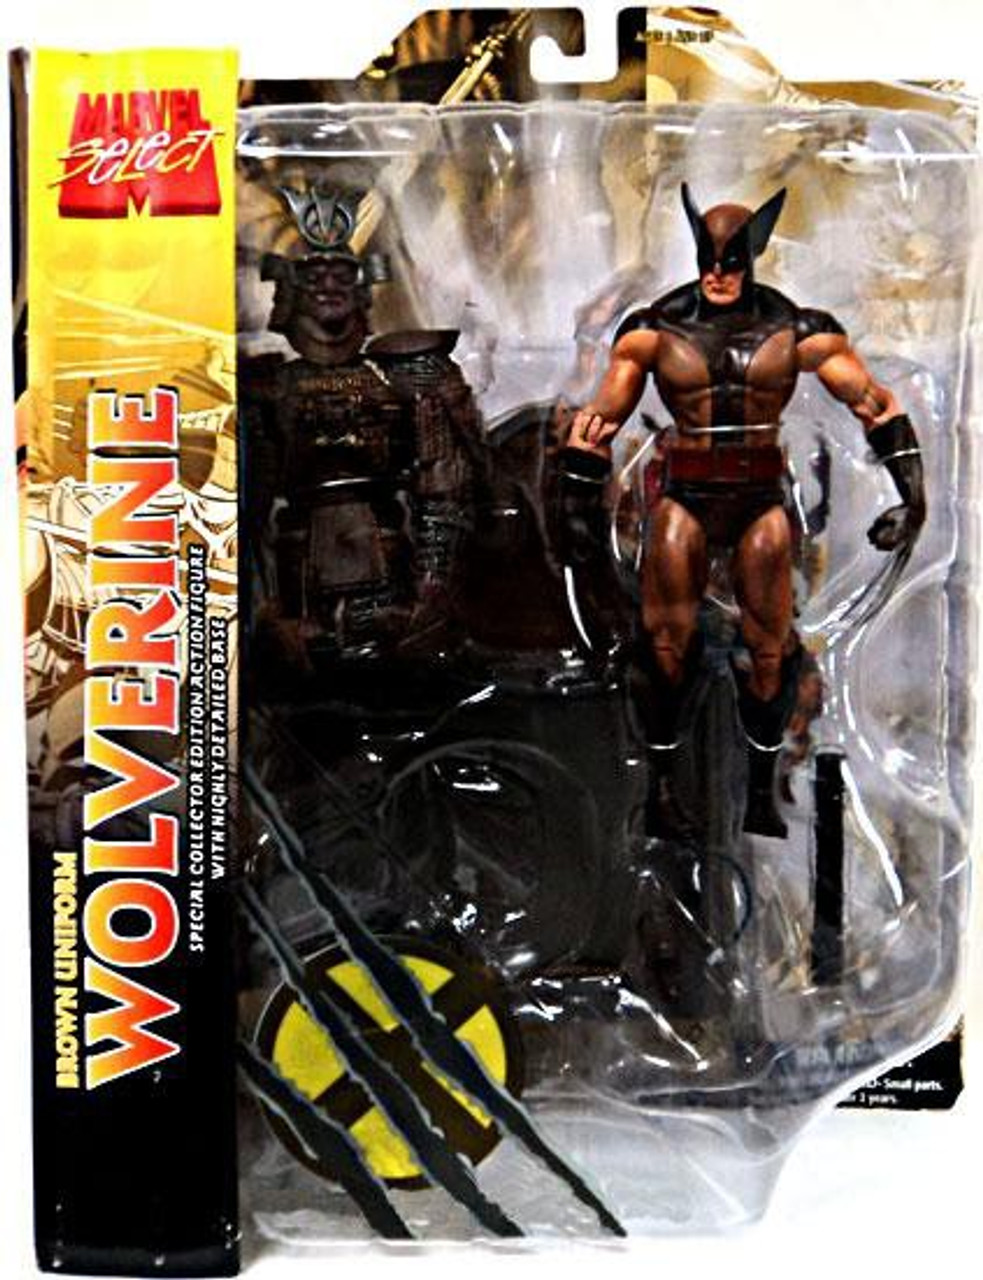 Marvel Select Brown Uniform Wolverine Exclusive Action Figure